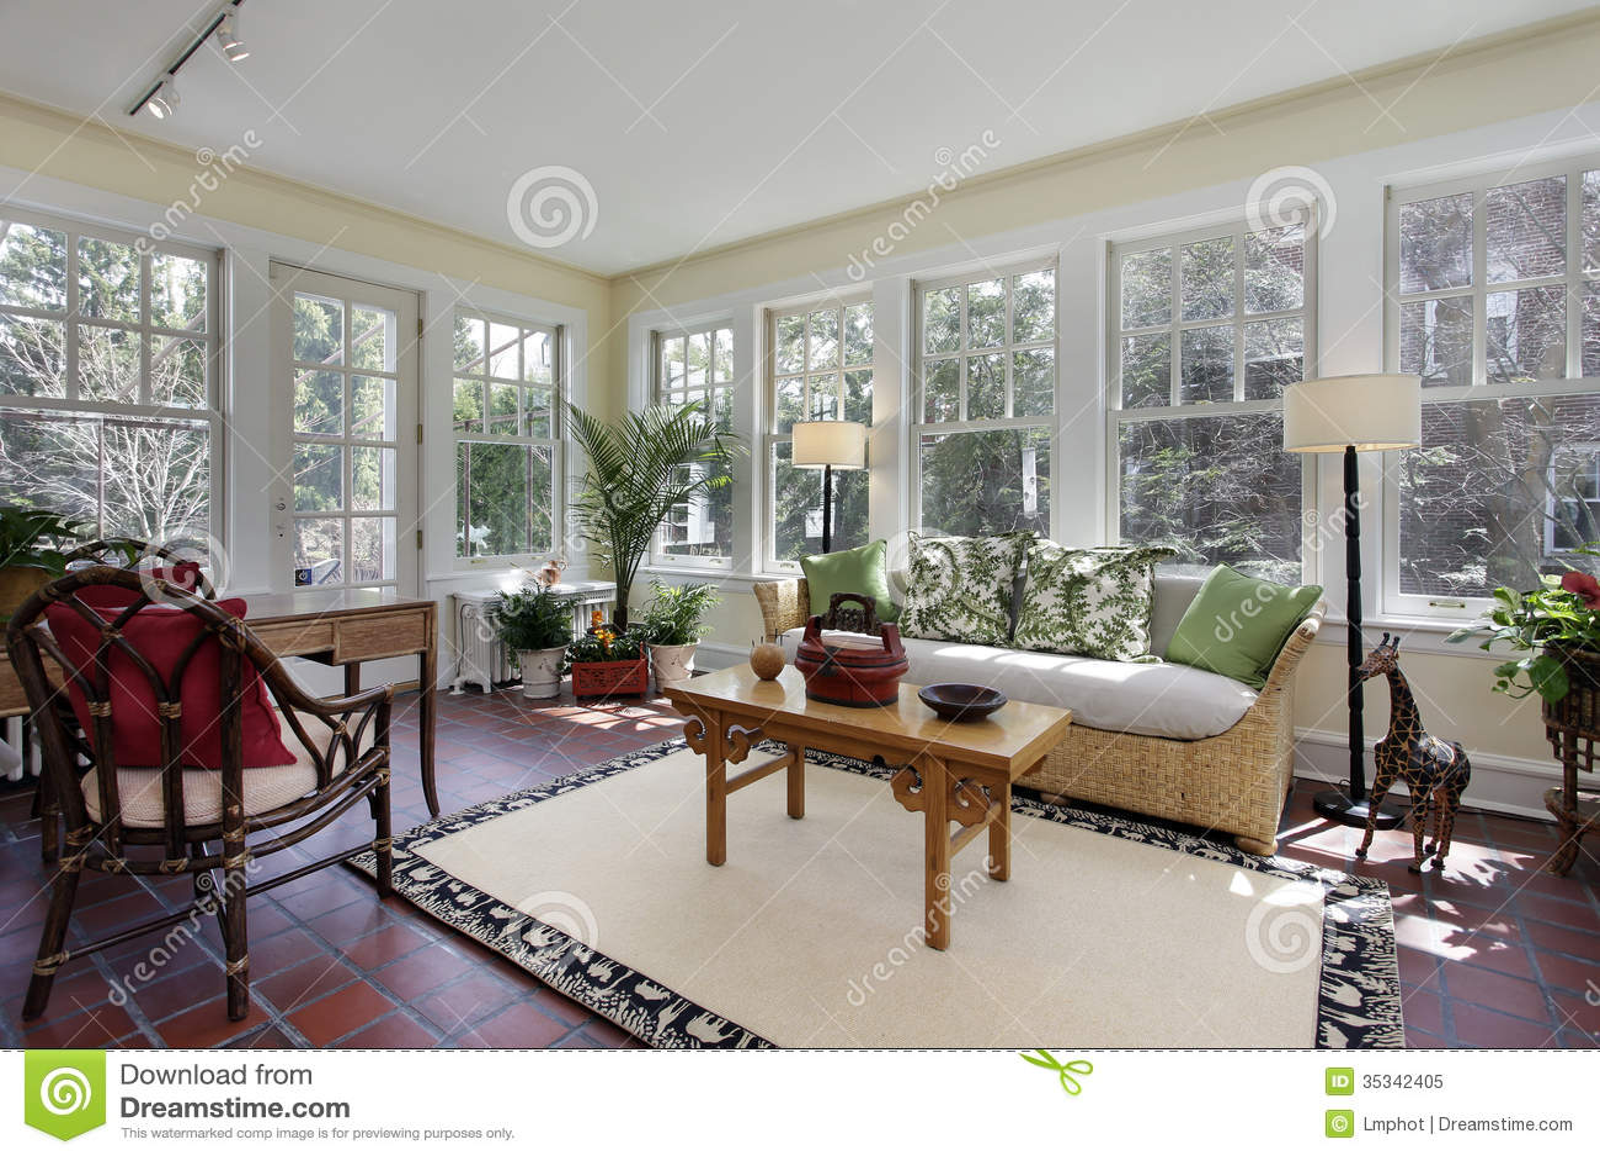 Sunroom With Red Brick Flooring Stock Image  Image 35342405